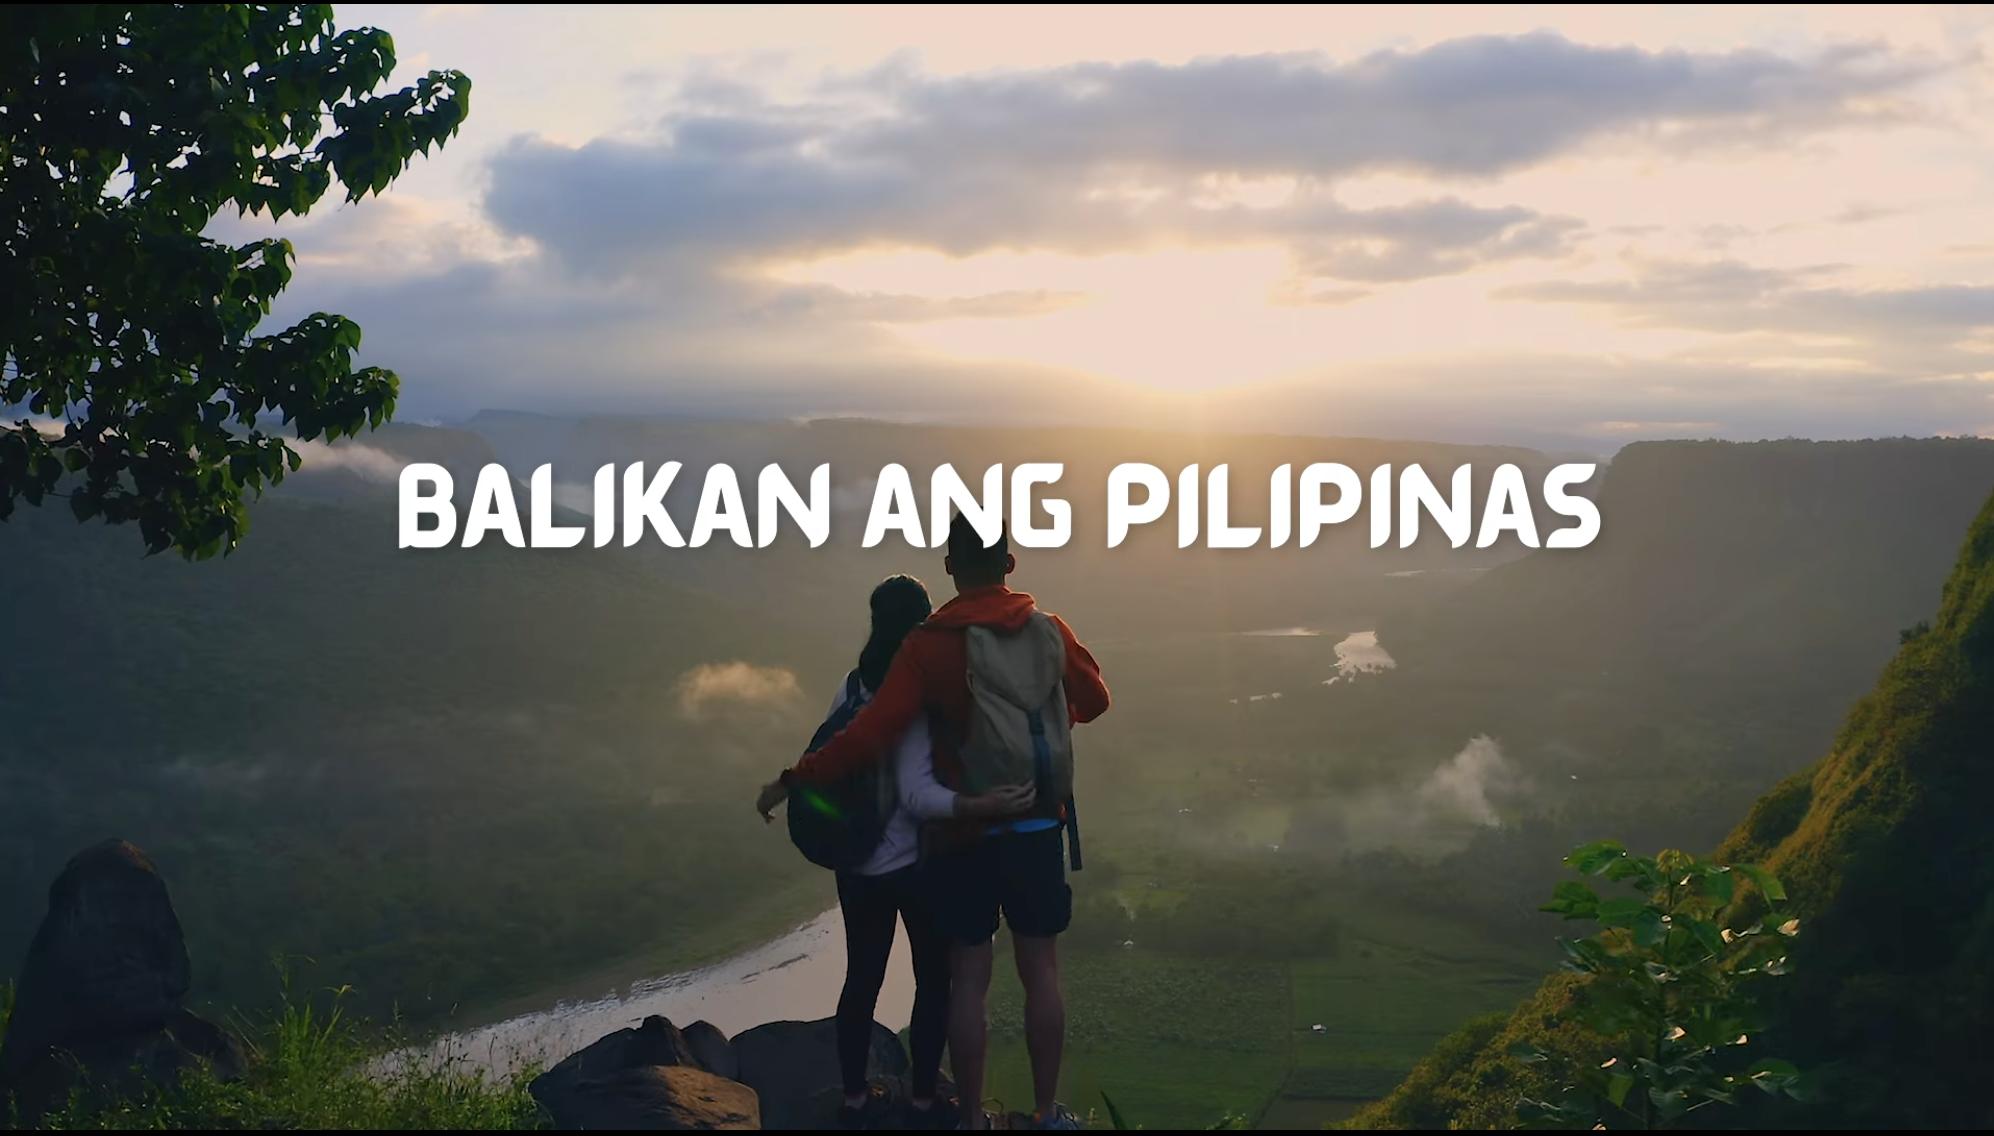 DOT inspires balikbayans to come home with 'Balikan Ang Pilipinas' campaign